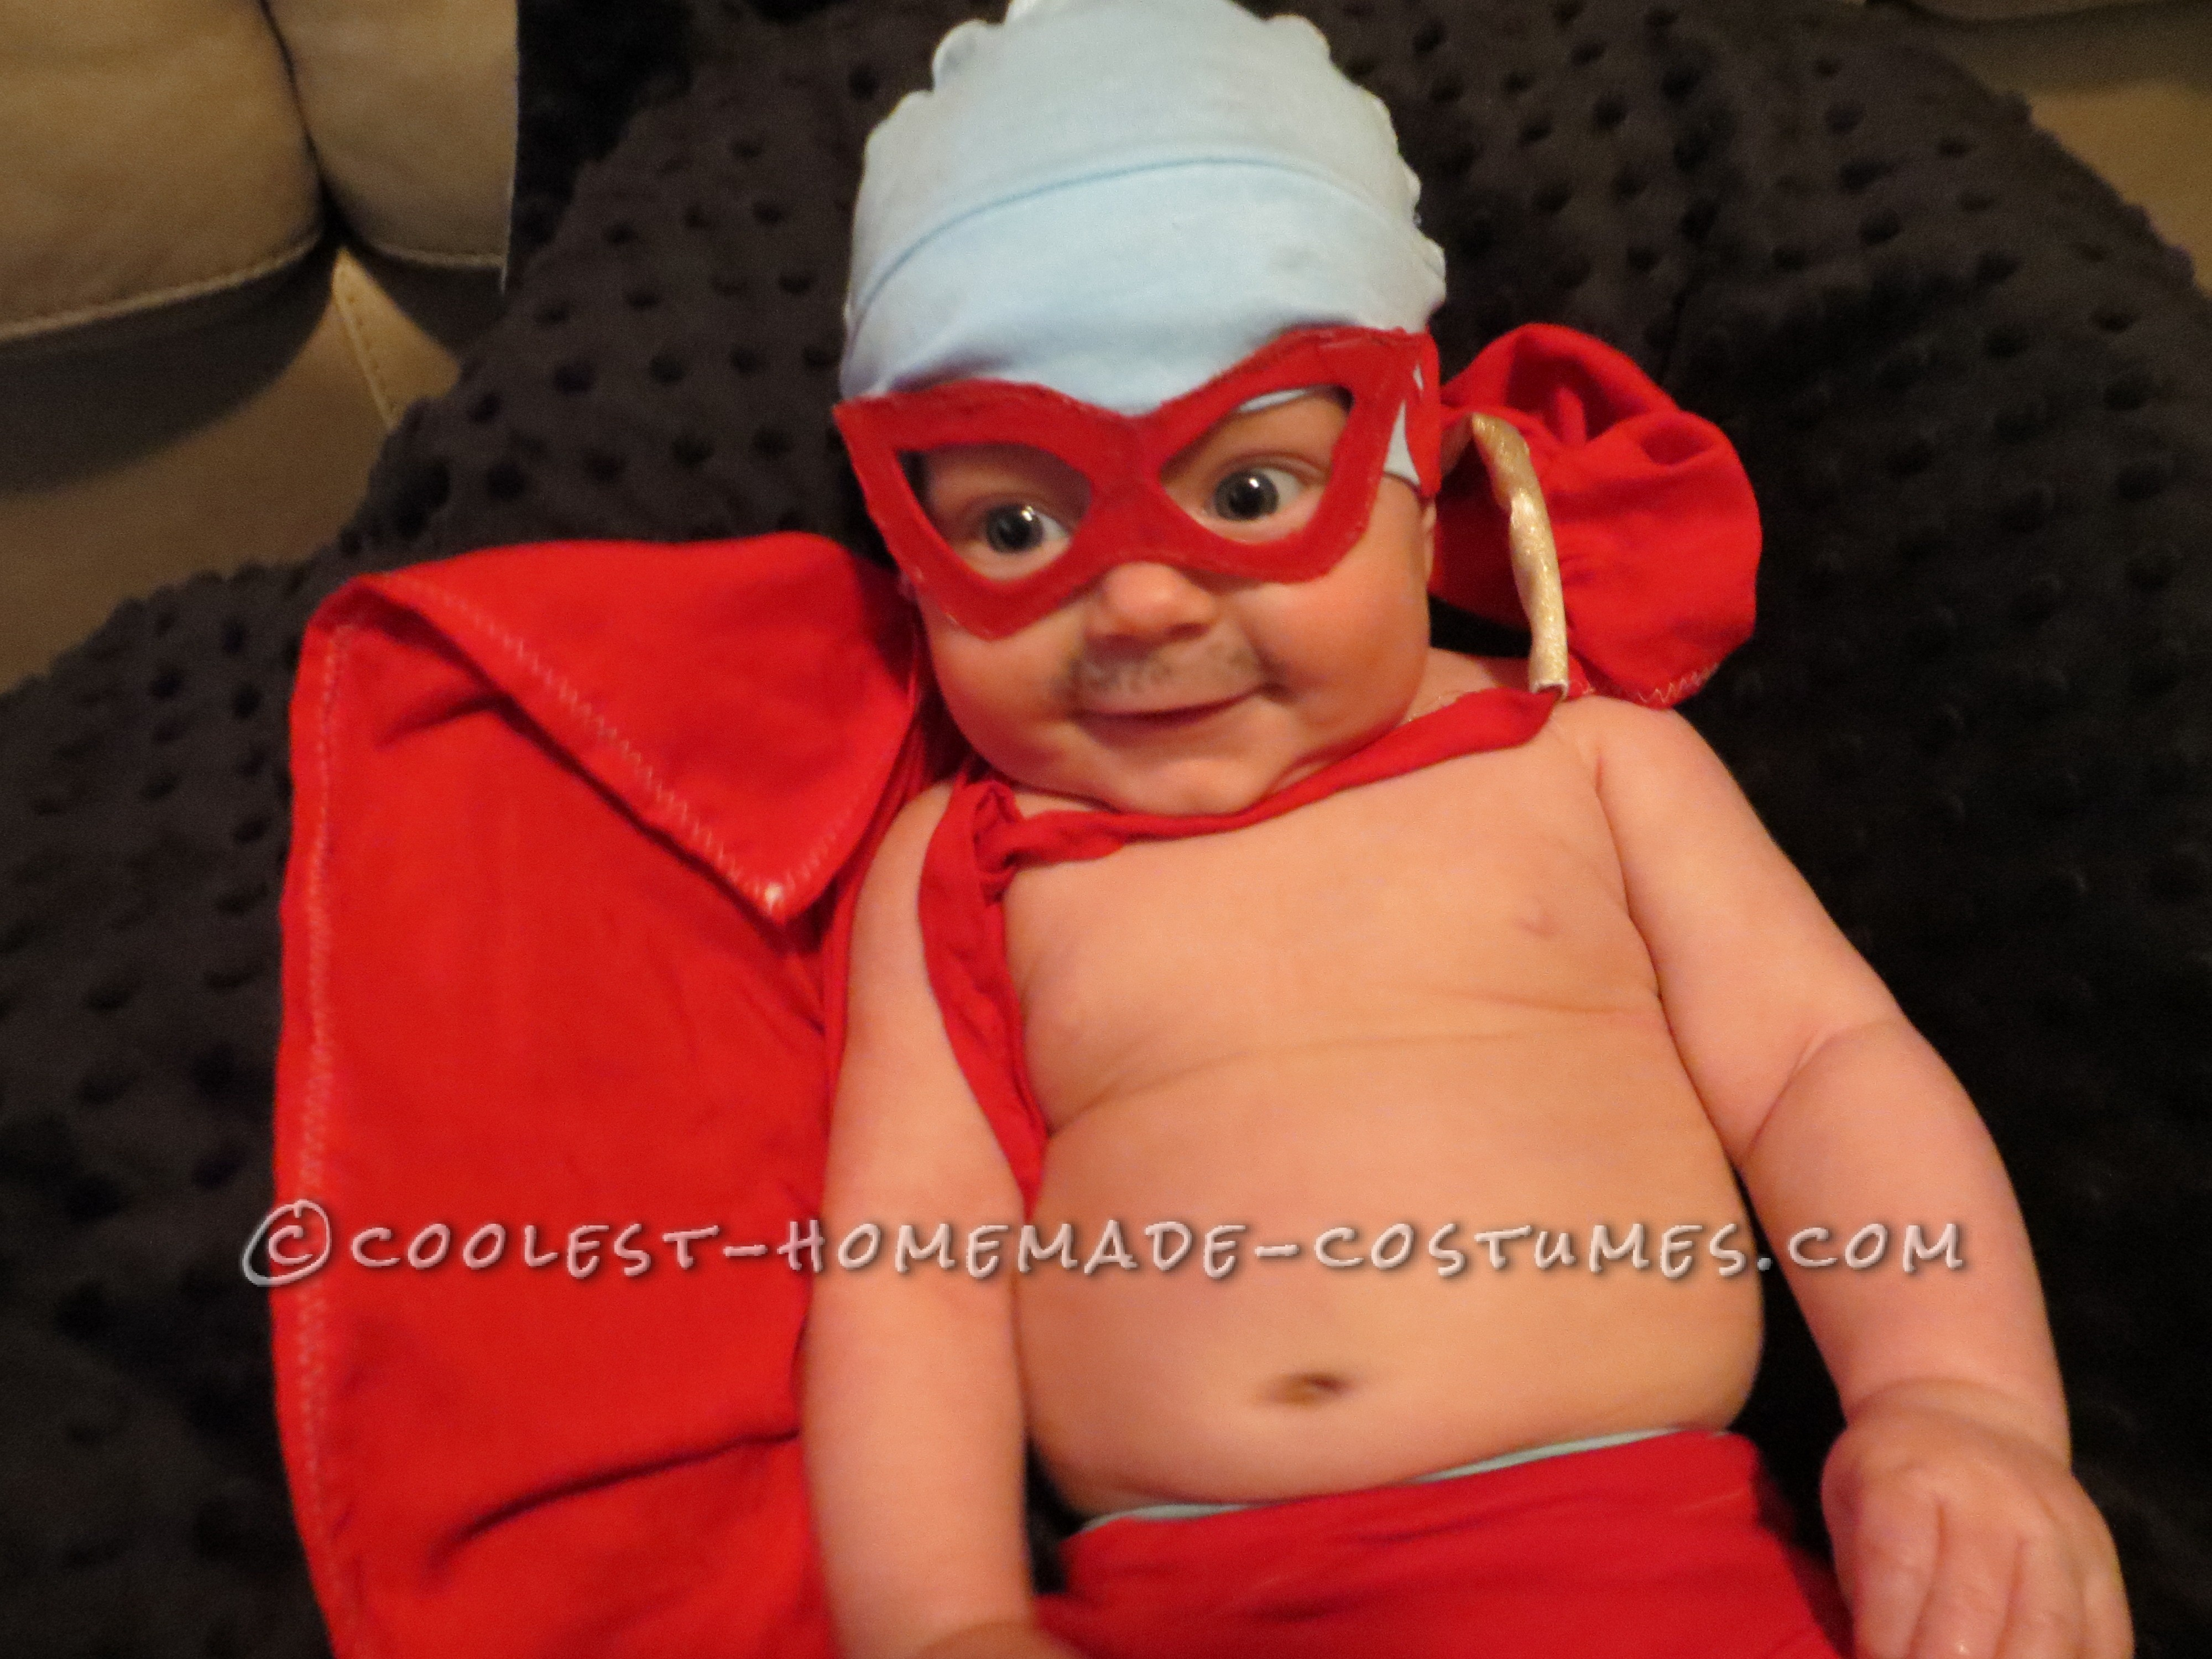 Baby Nacho Libre Costume - Need I Say More?